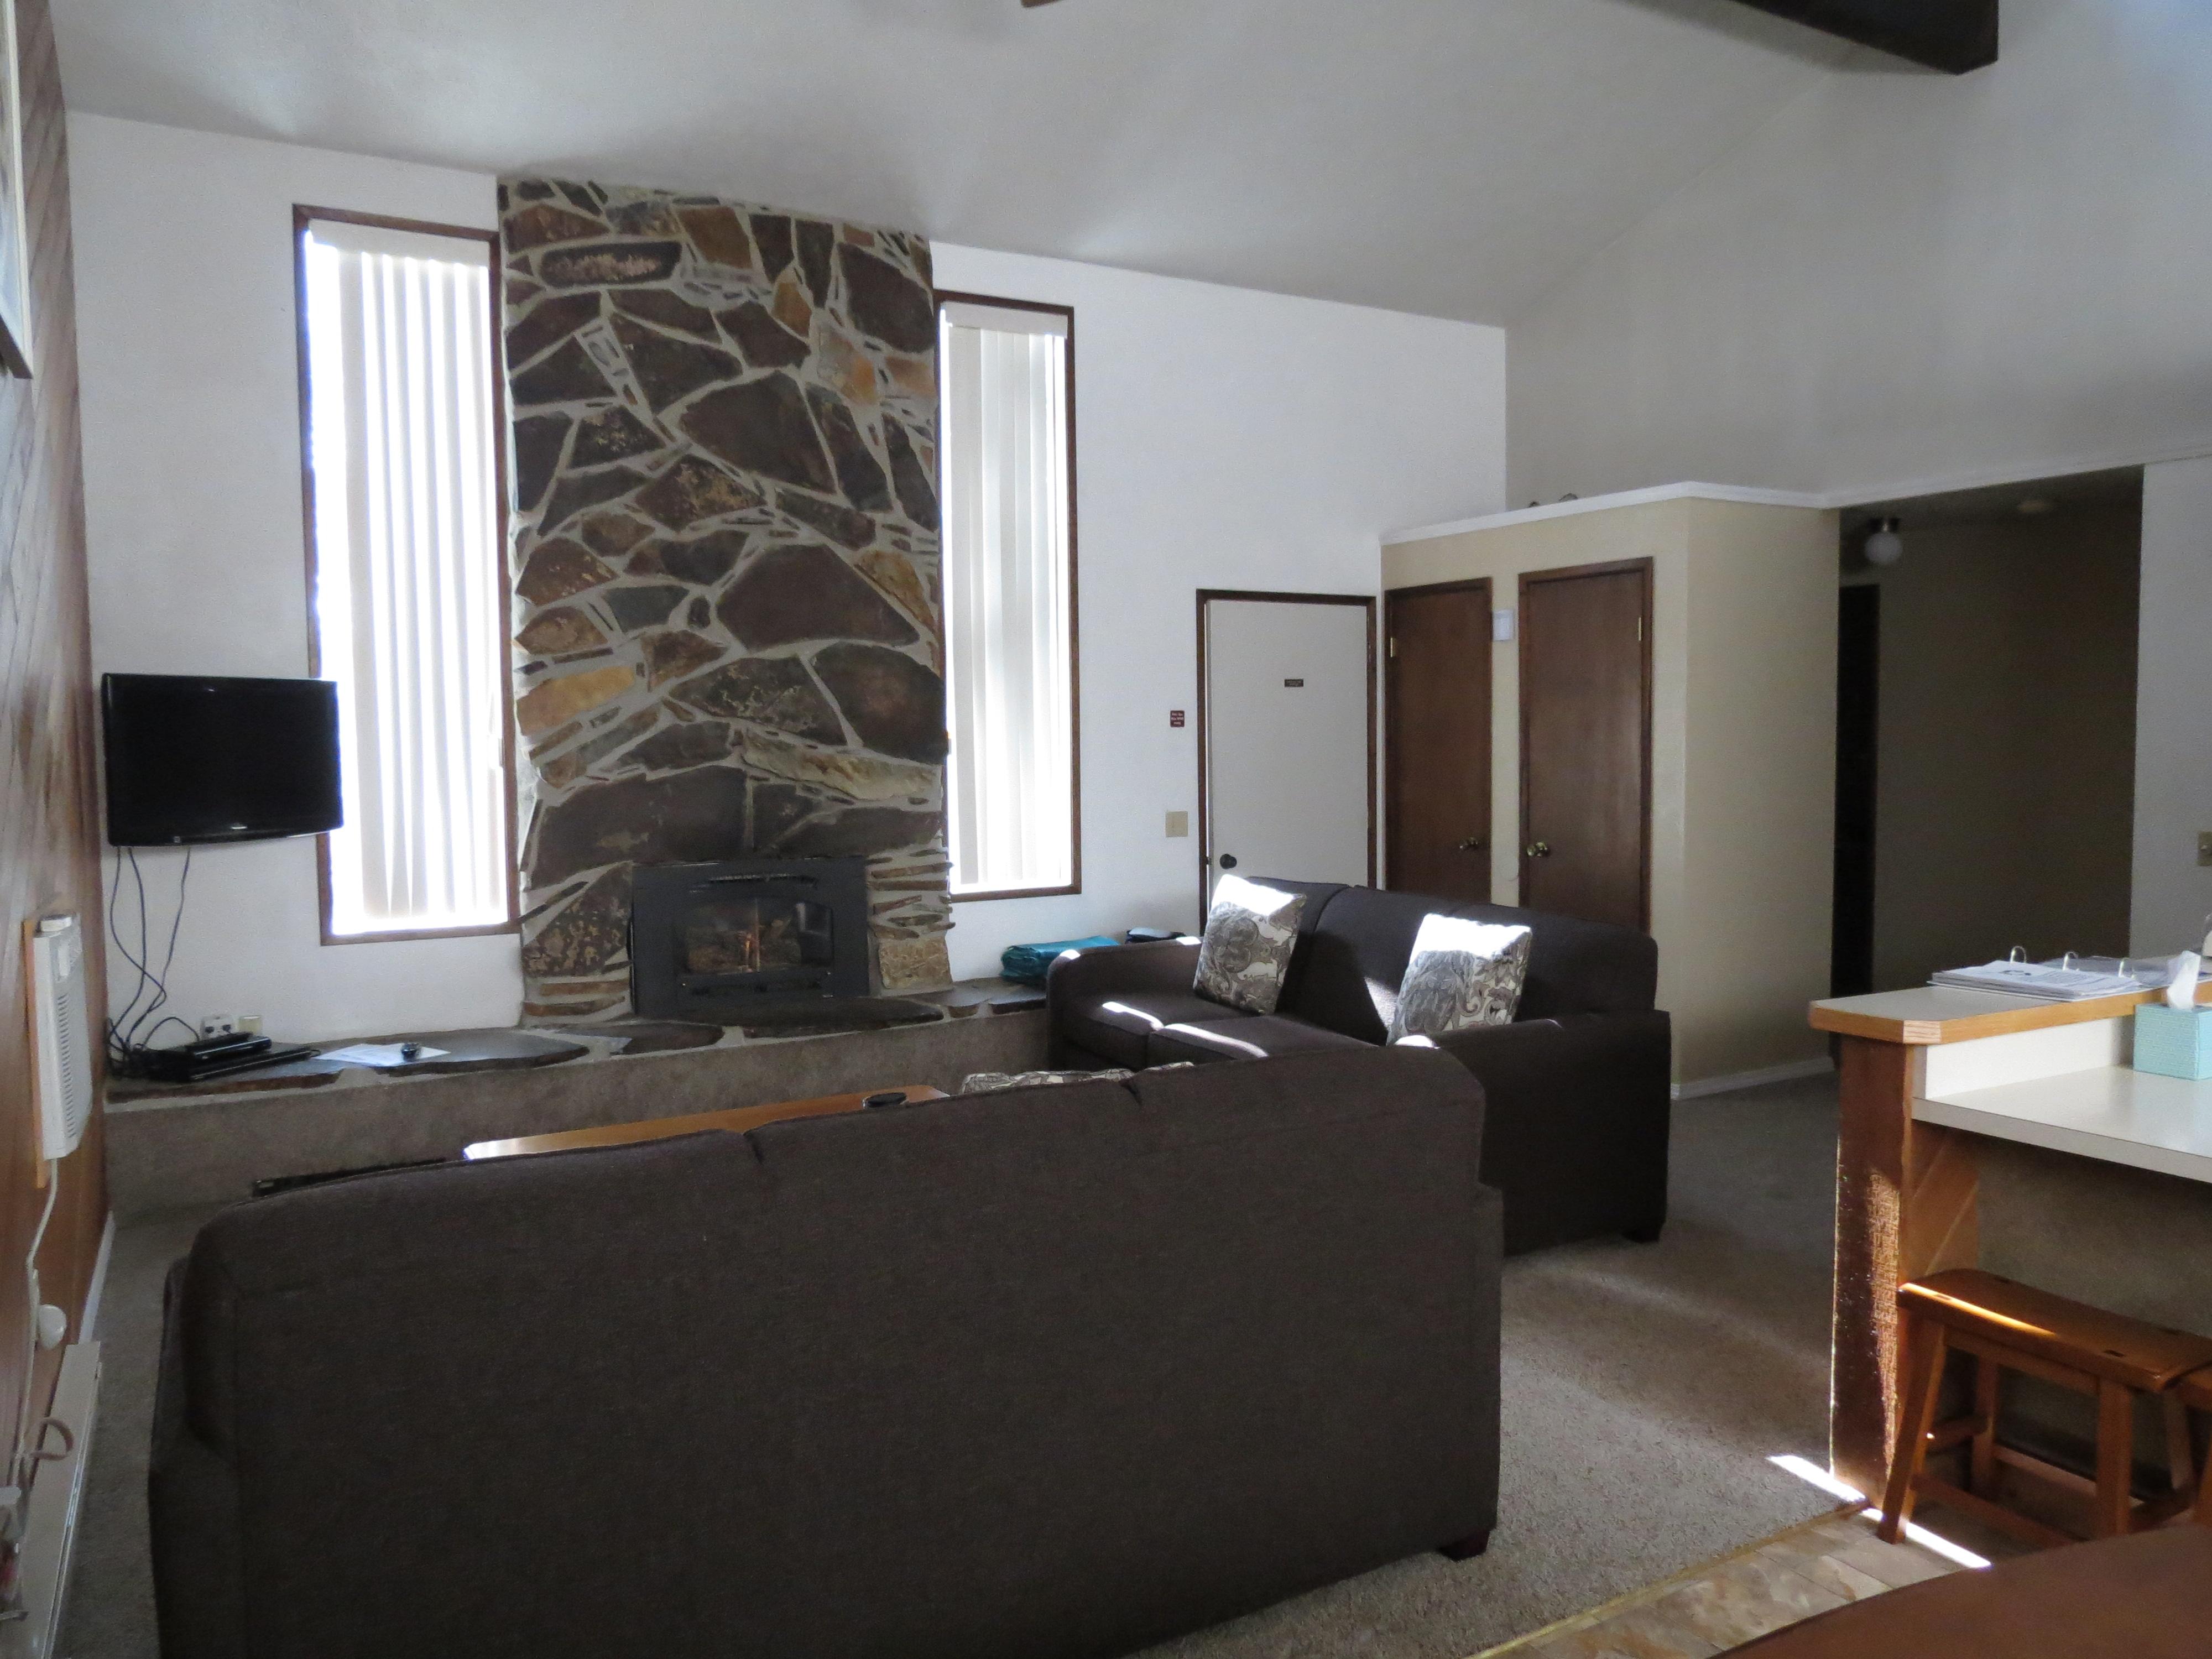 Crestwood Resort image